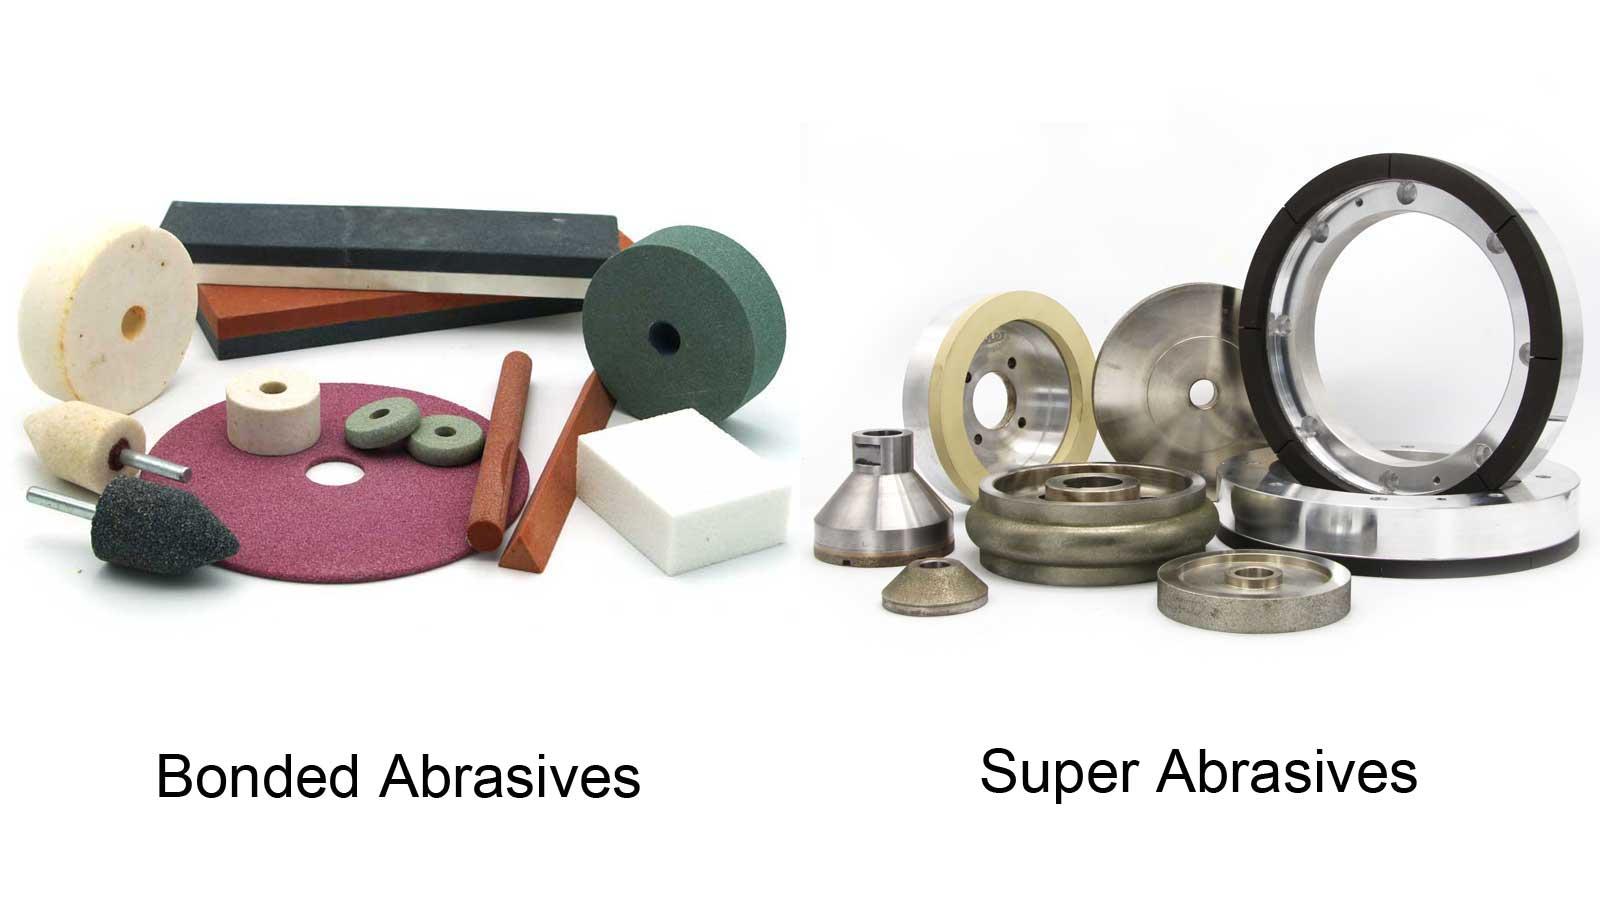 super abrasives and conventional bonded abrasives